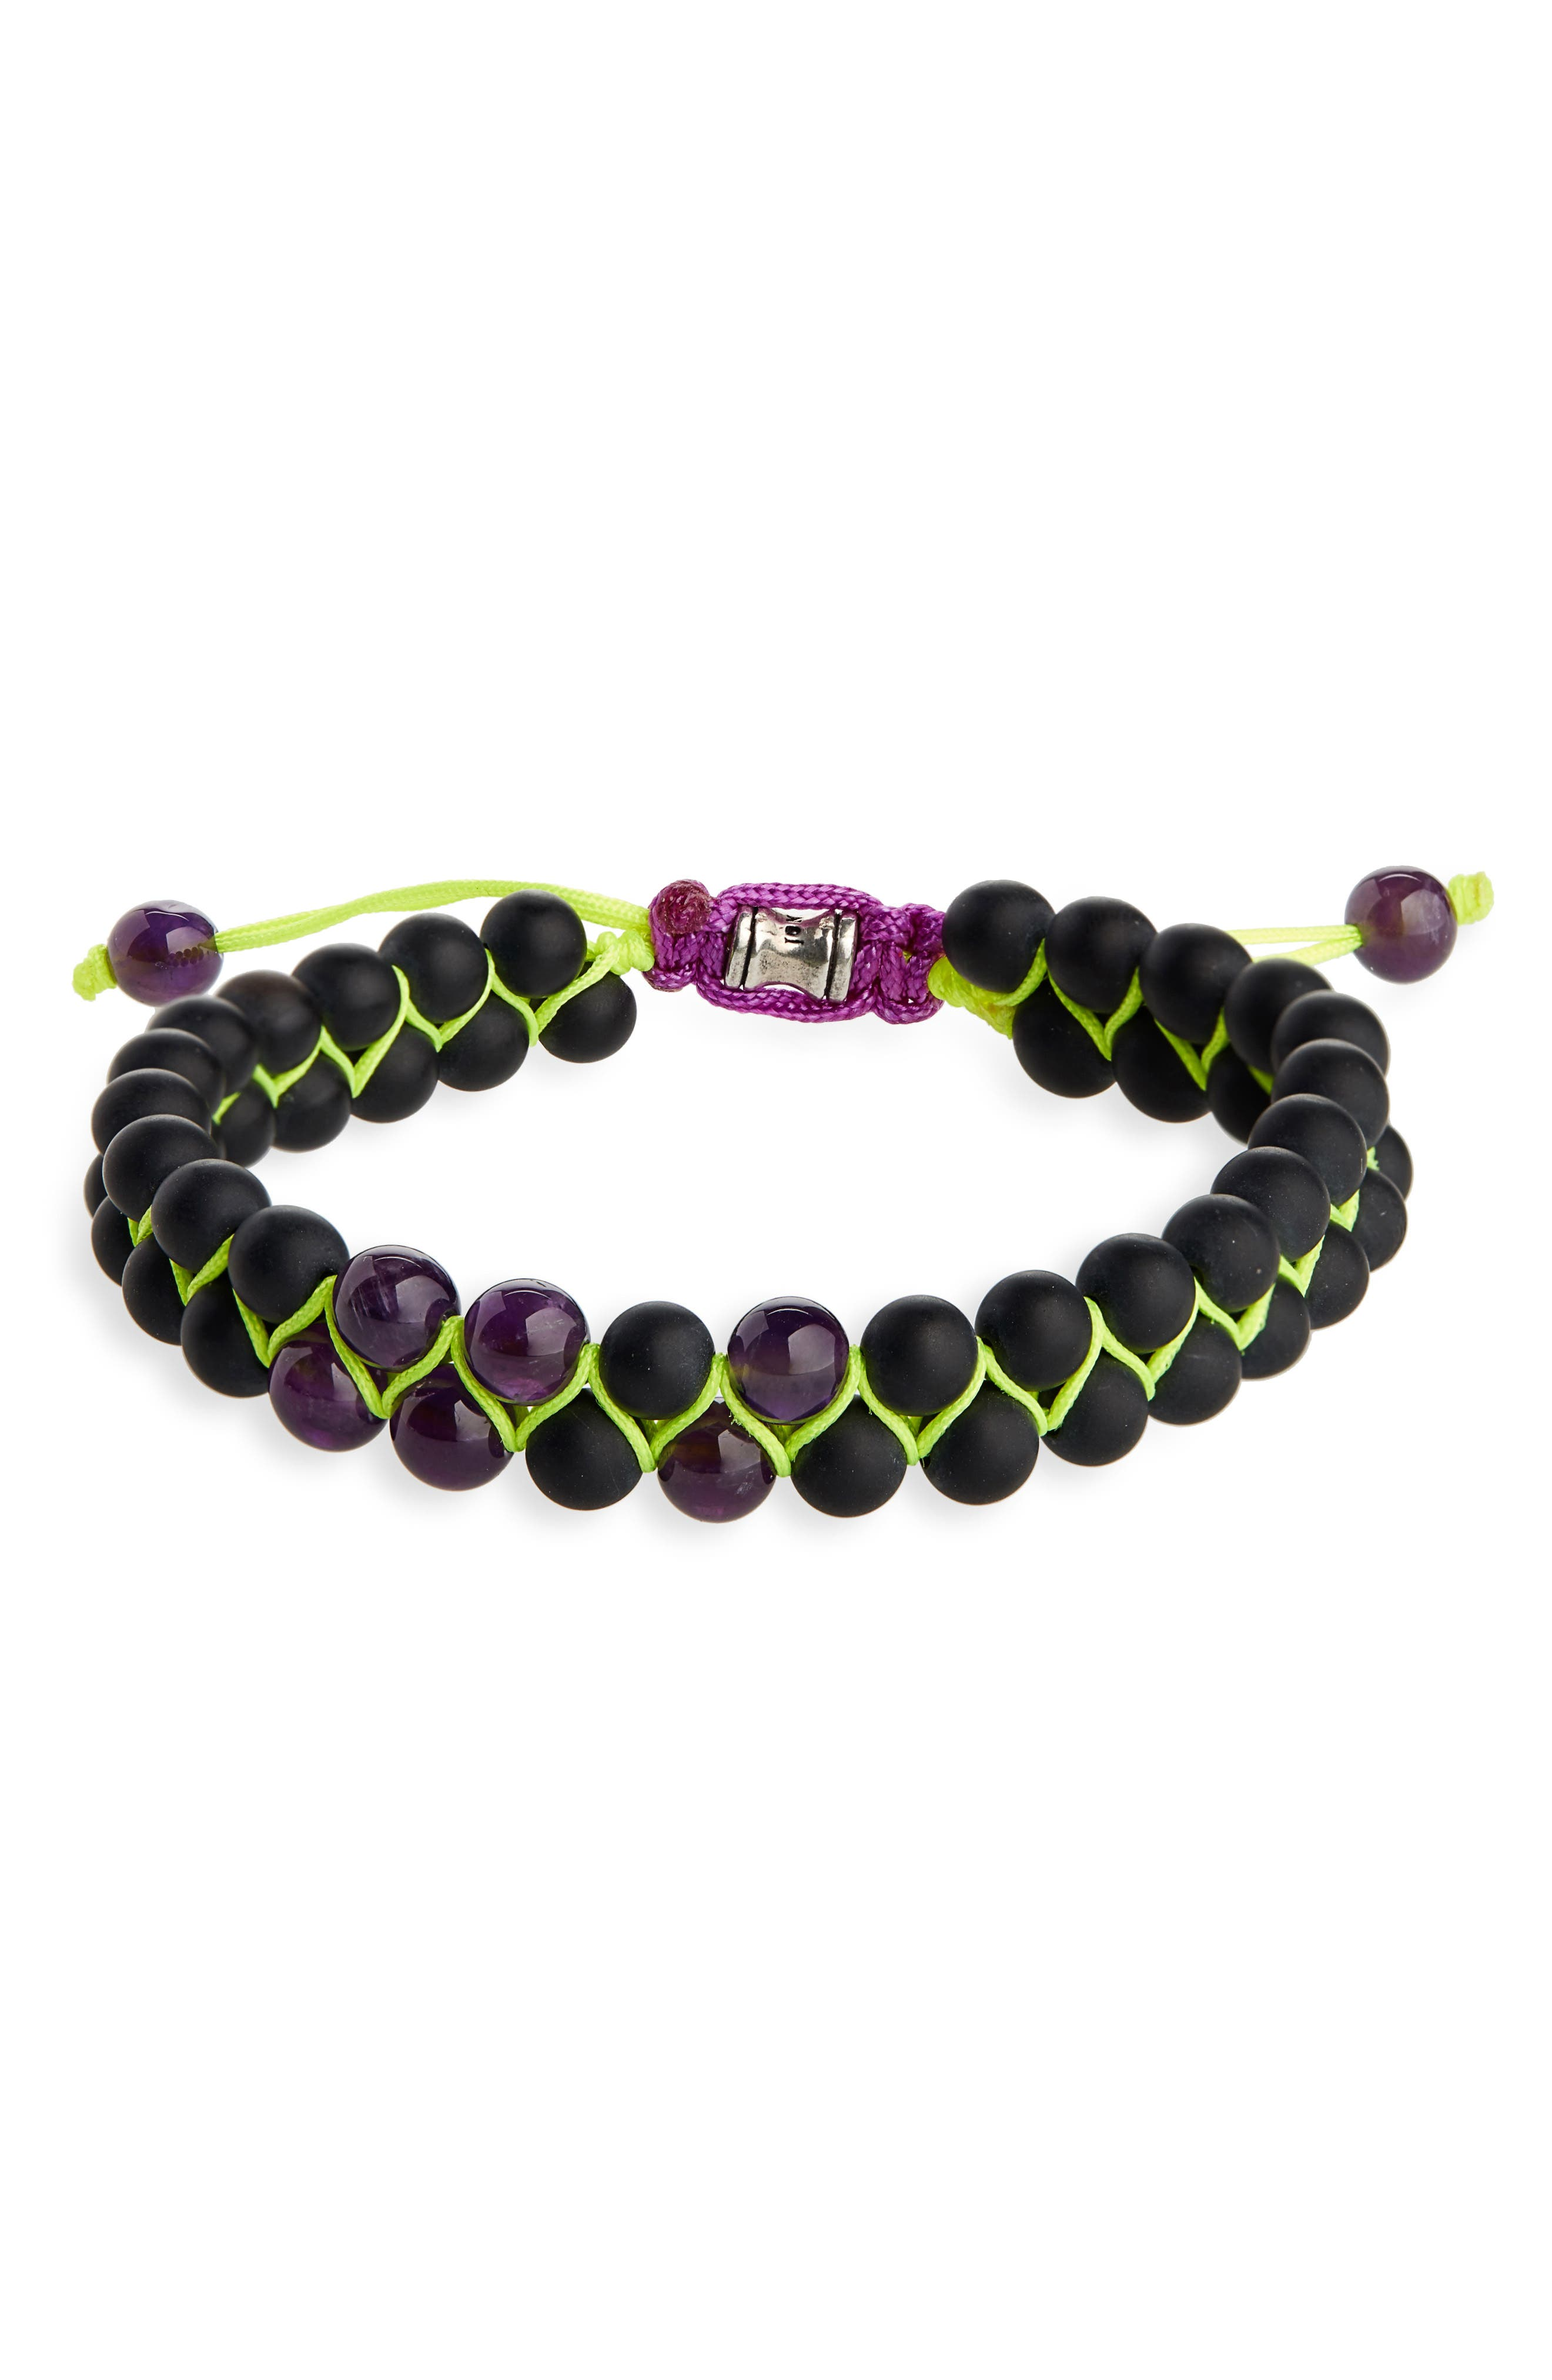 JONAS STUDIO Double Woven Bead Bracelet in Black